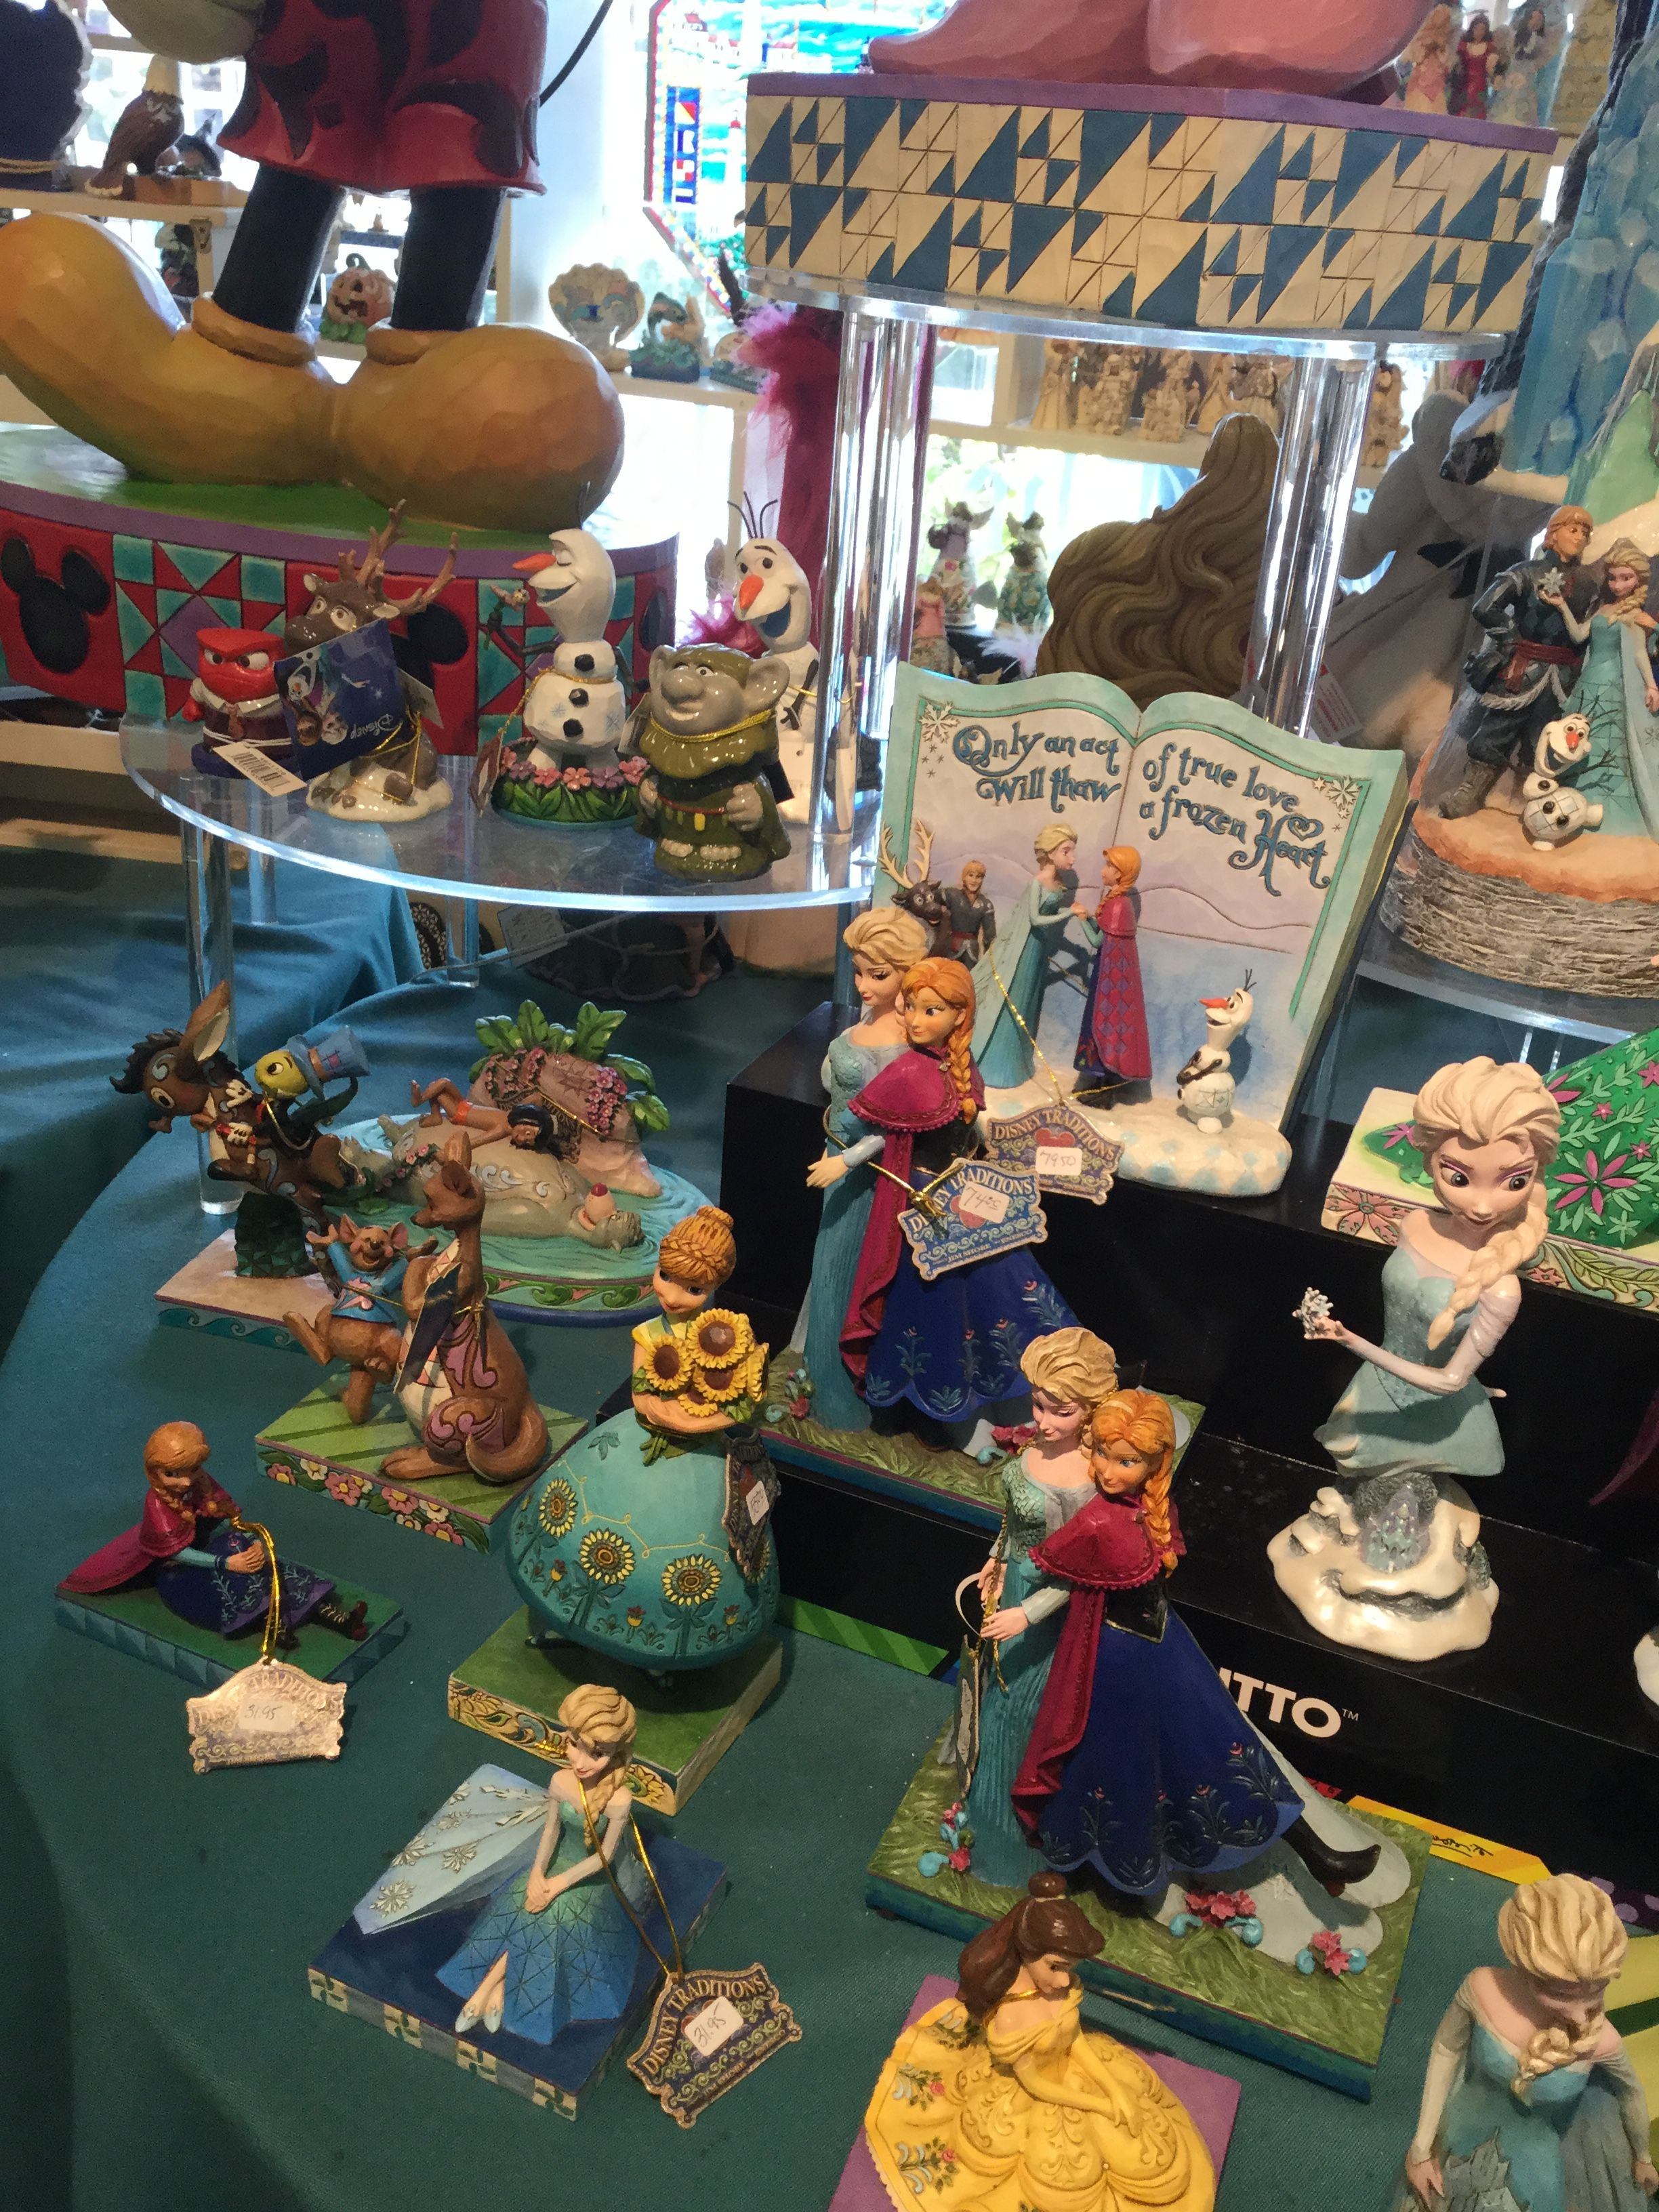 Myrtle Beach Broadway: The Mole Holes- Disney Arts | Places I Have ...